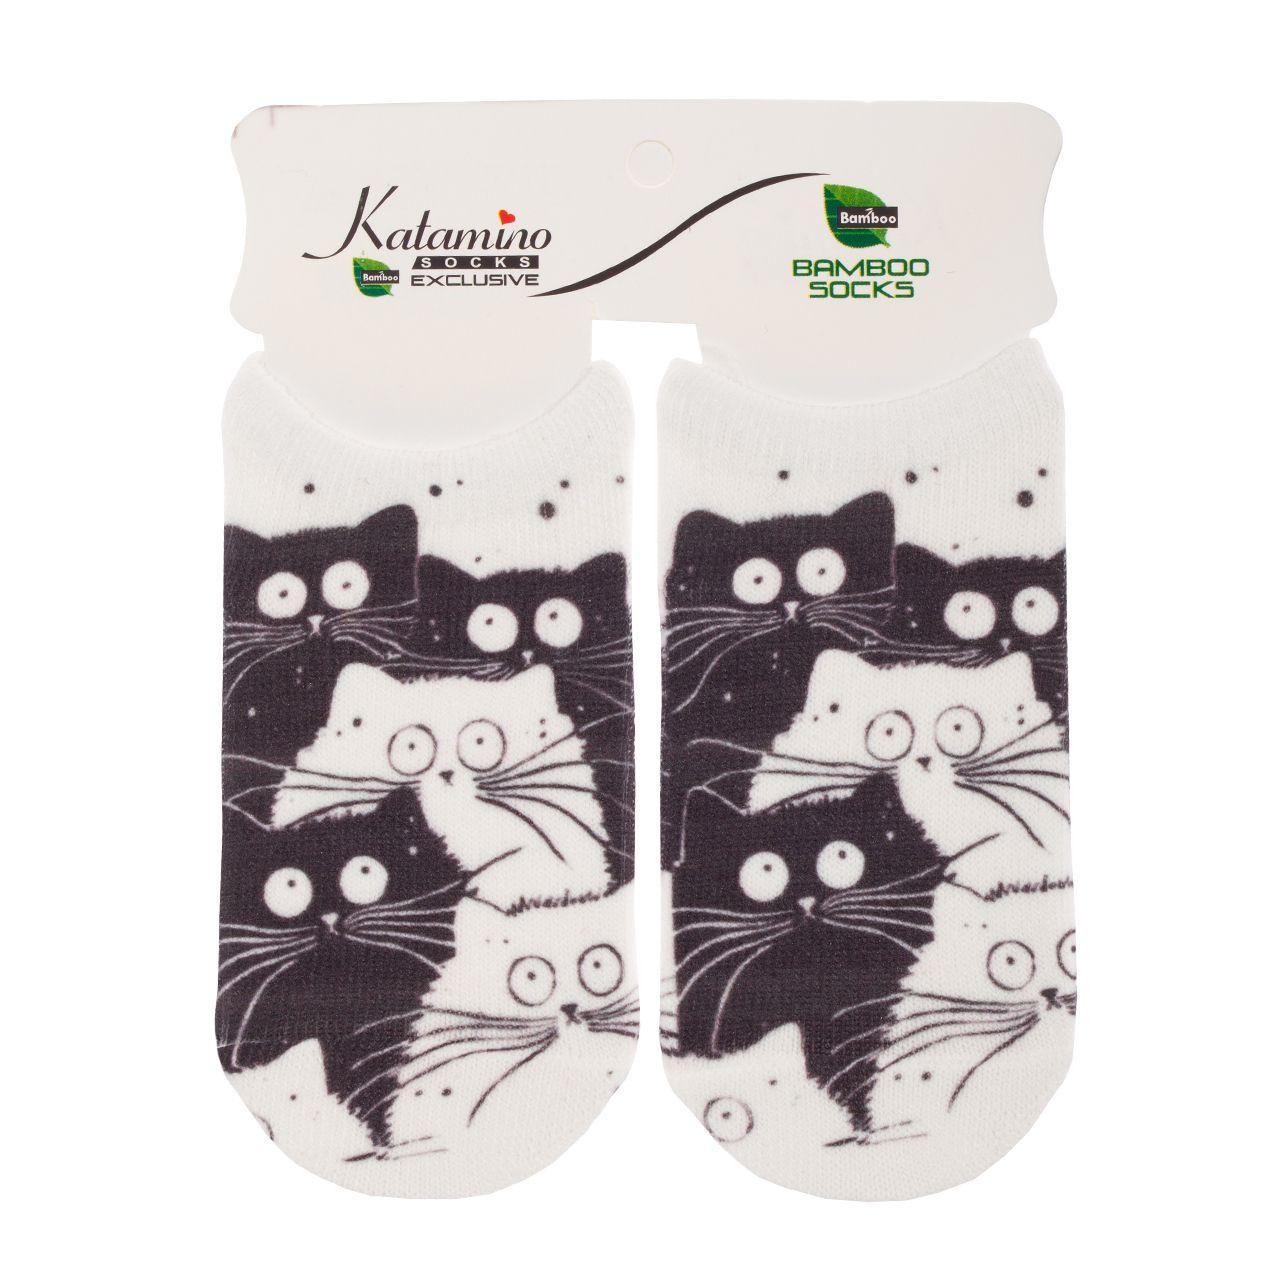 جوراب نوزاد کاتامینو طرح گربه -  - 1